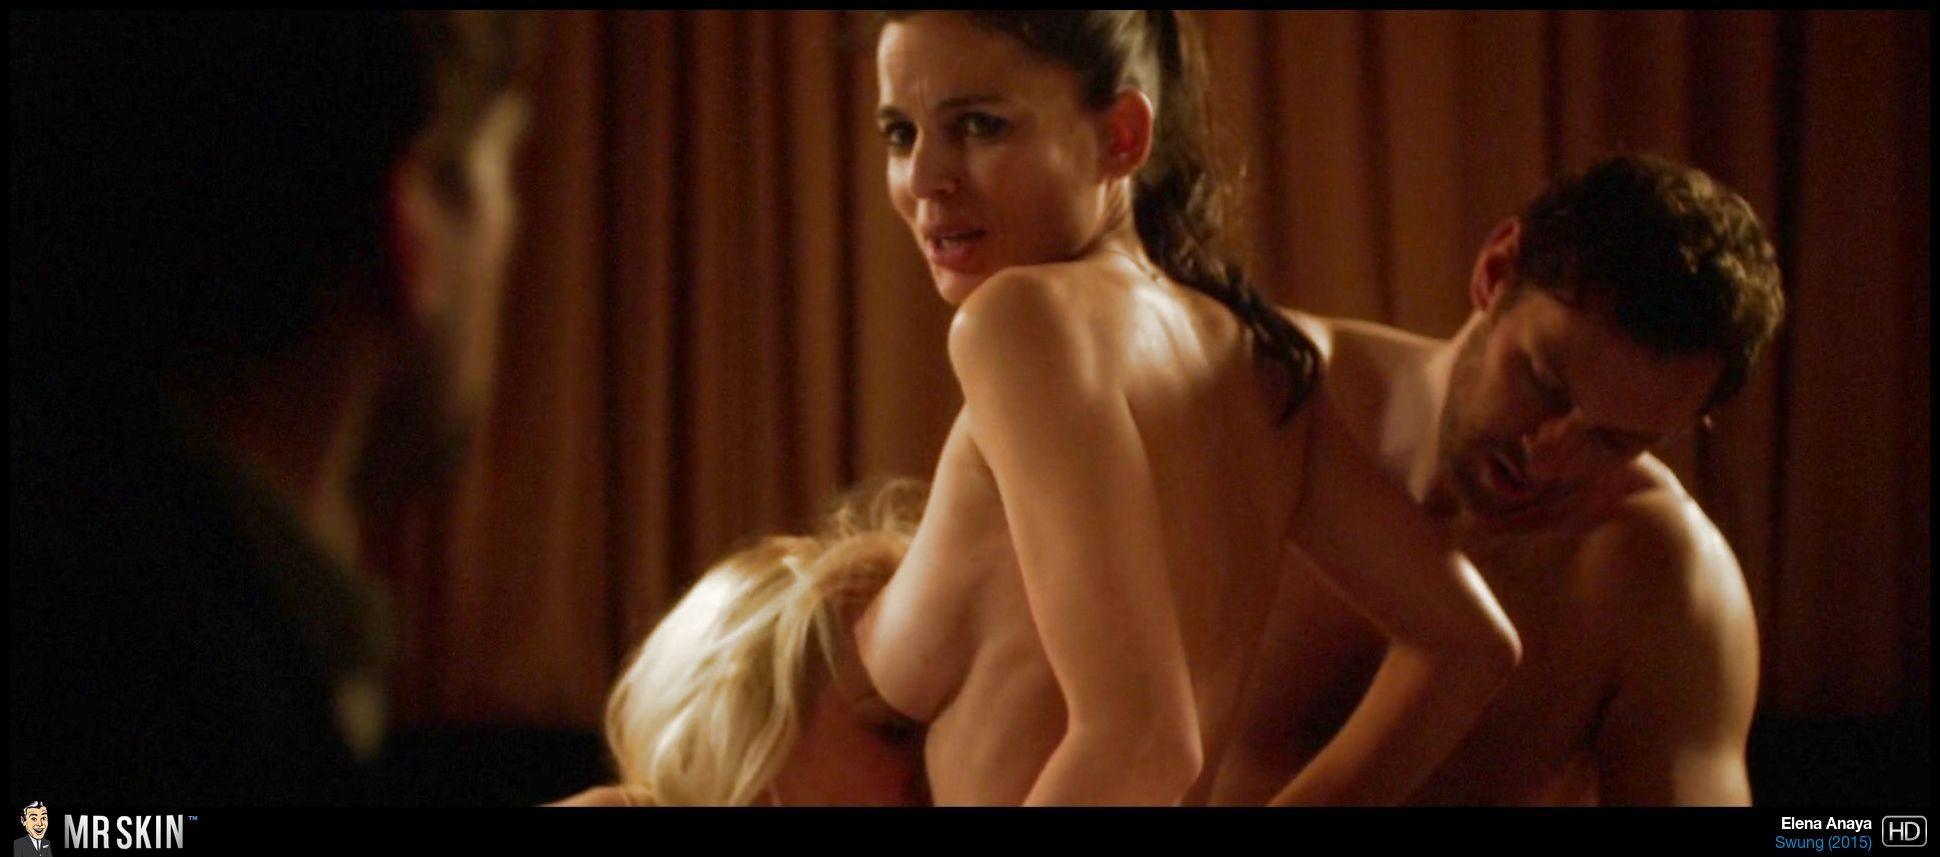 elena naked